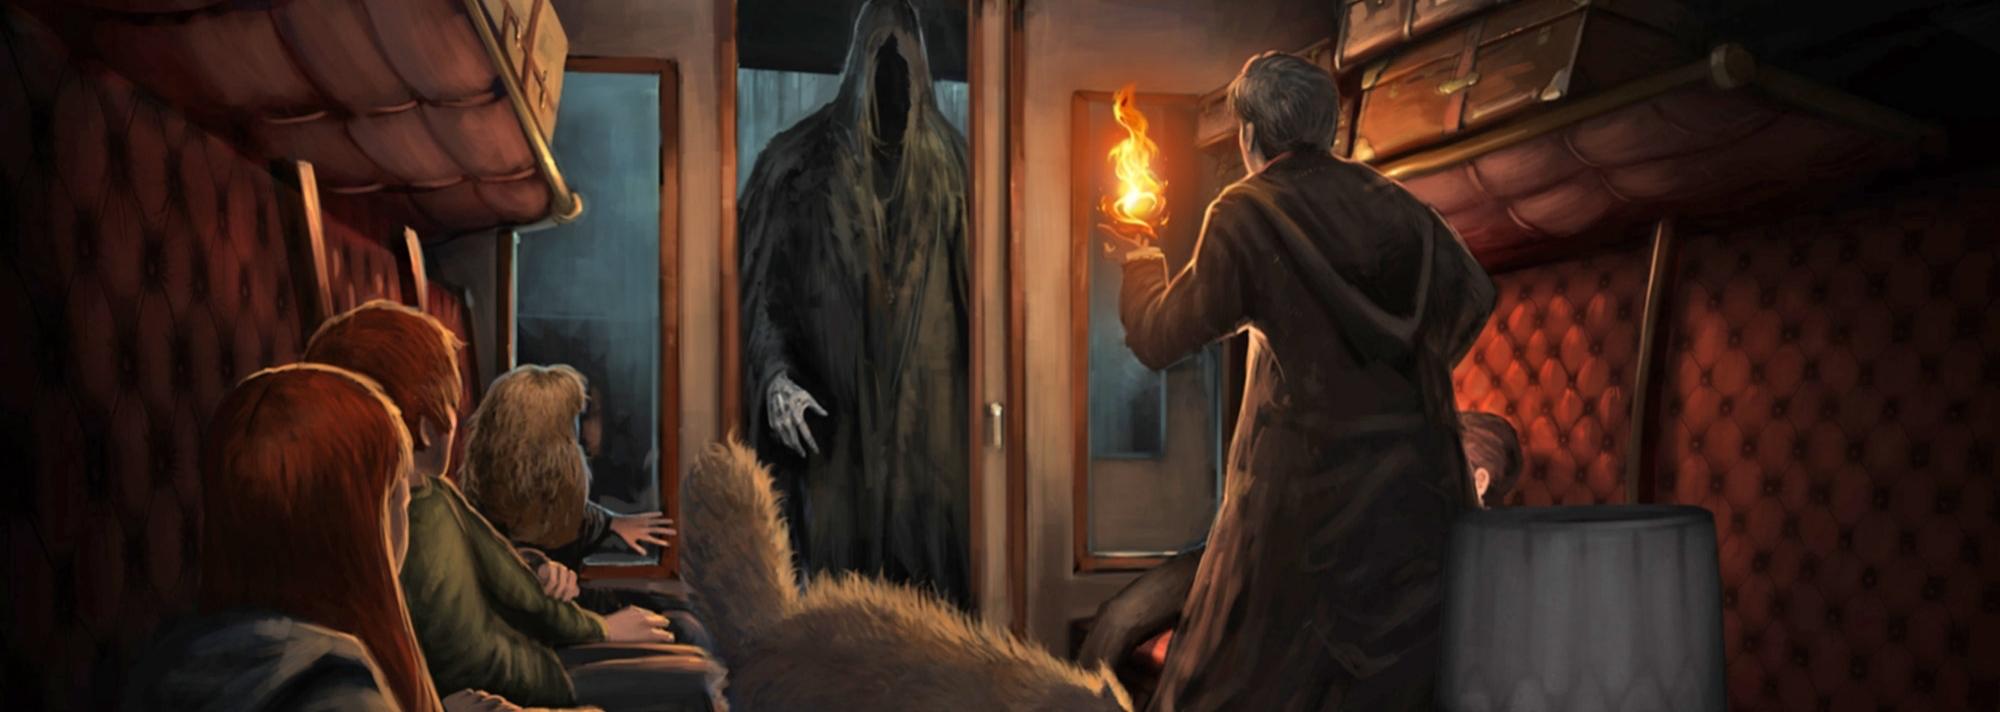 B3C5M7 Dementor on Hogwarts Express.png